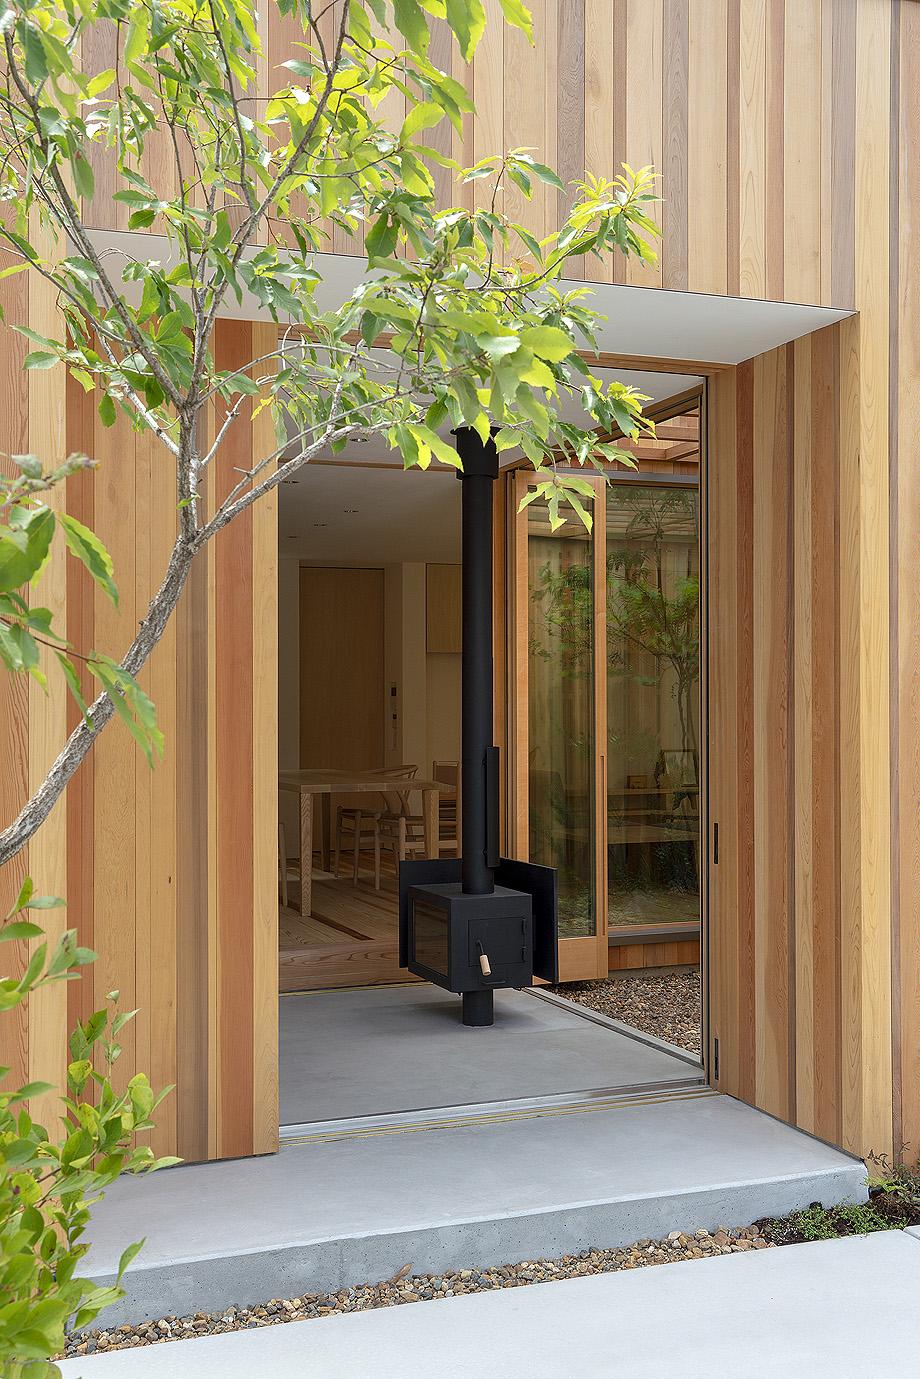 casa en akashi de arbol - foto yasunori shimomura (4)